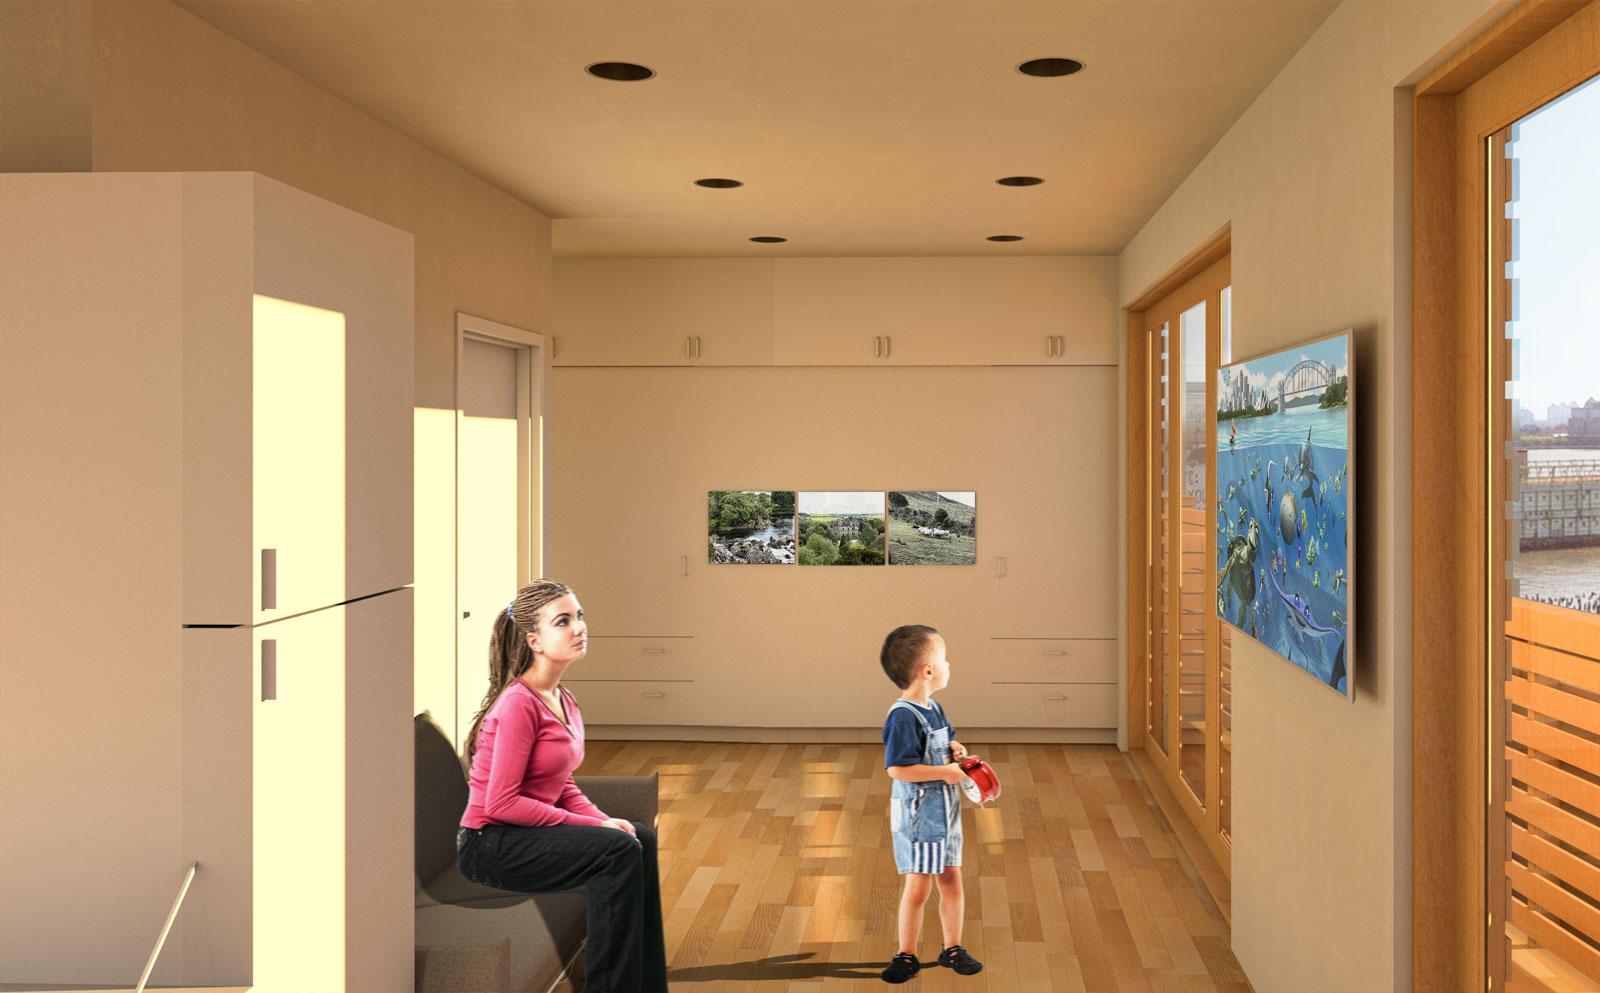 Multi-purpose space as living room